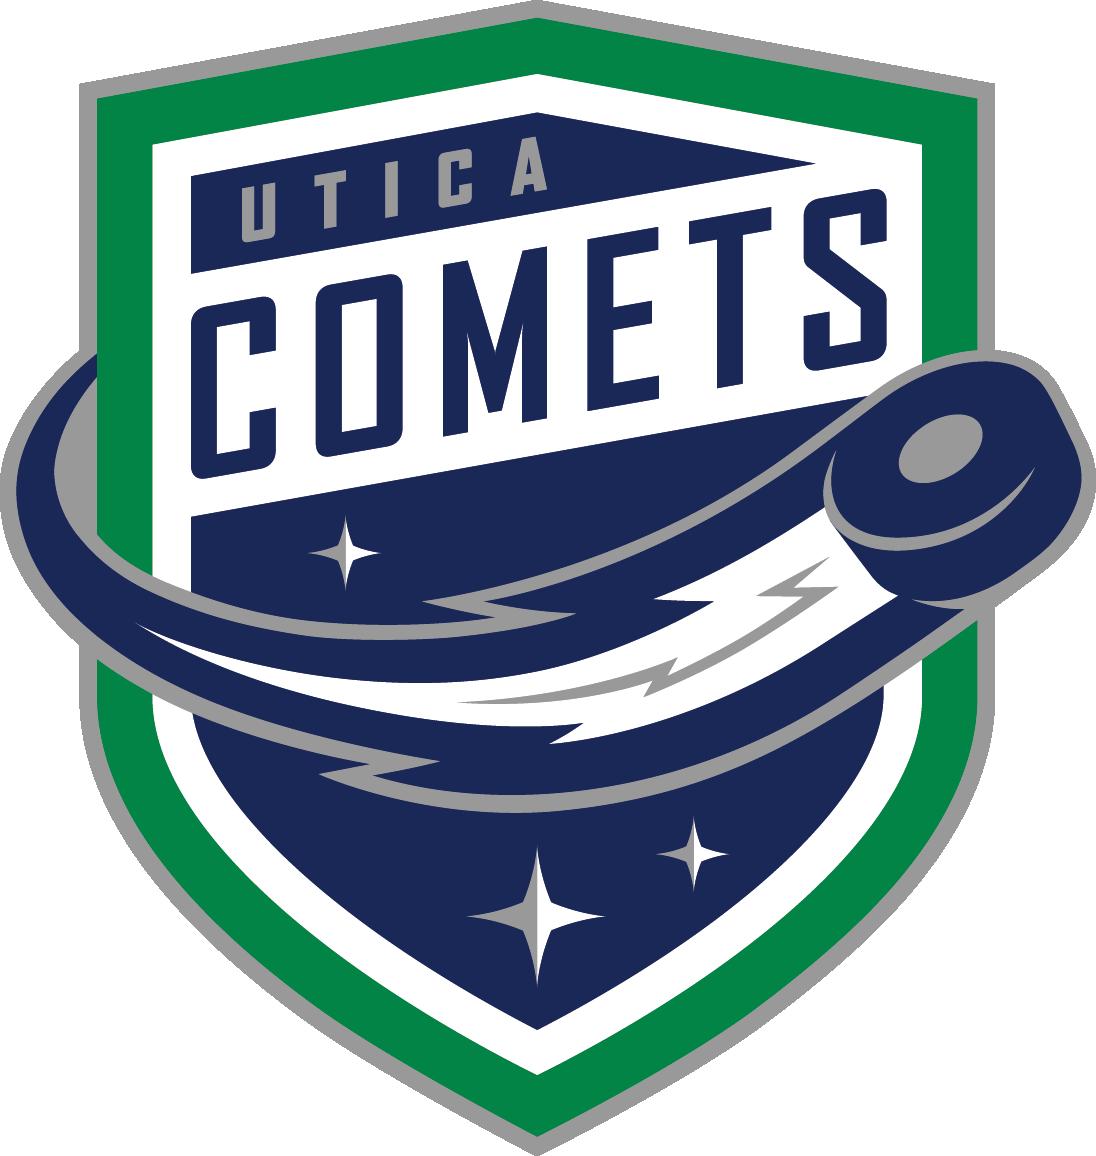 utica_comets_2013-14